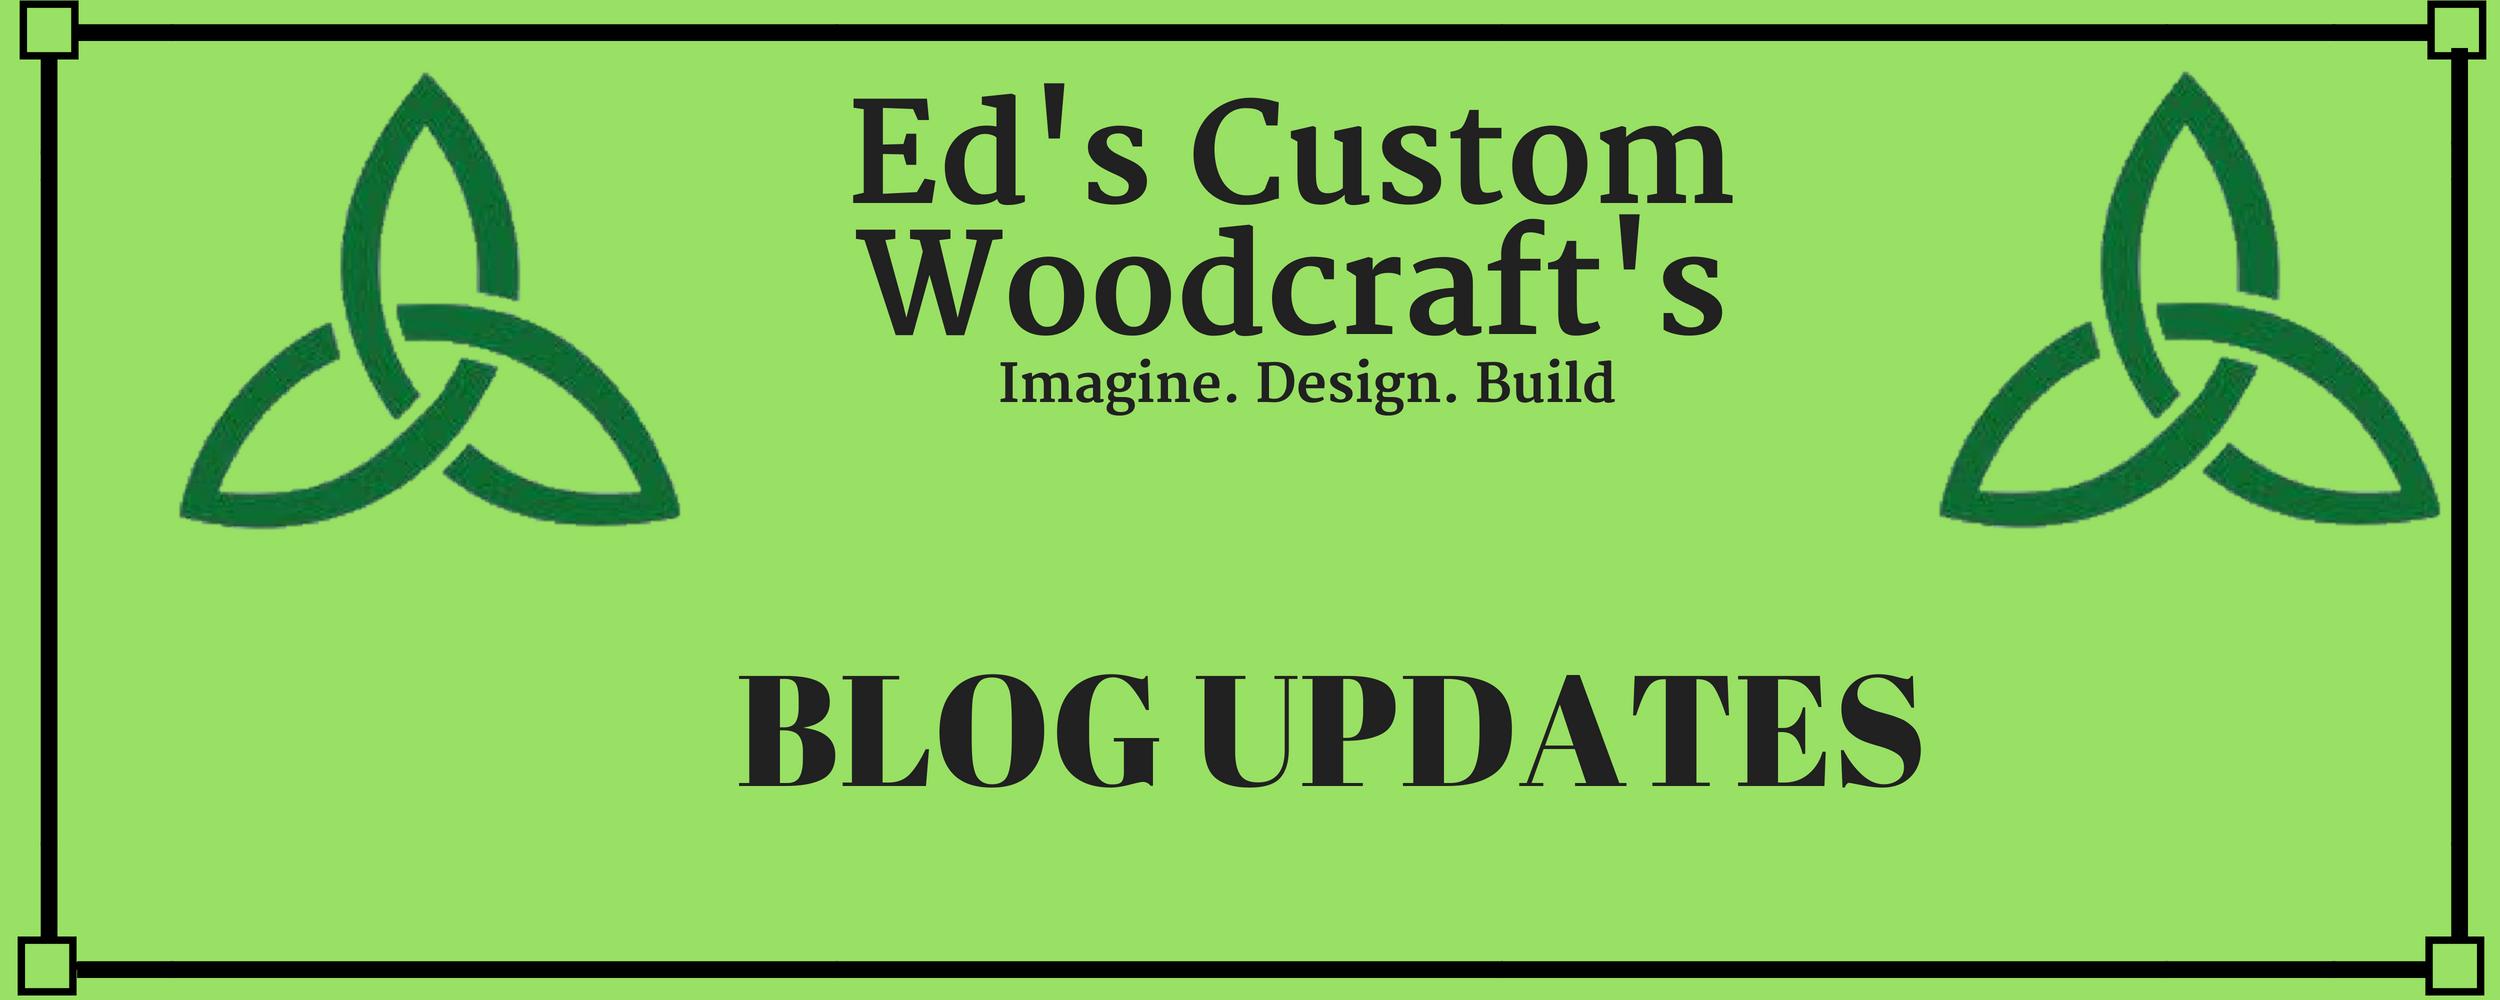 Ed's Custom (6).jpg